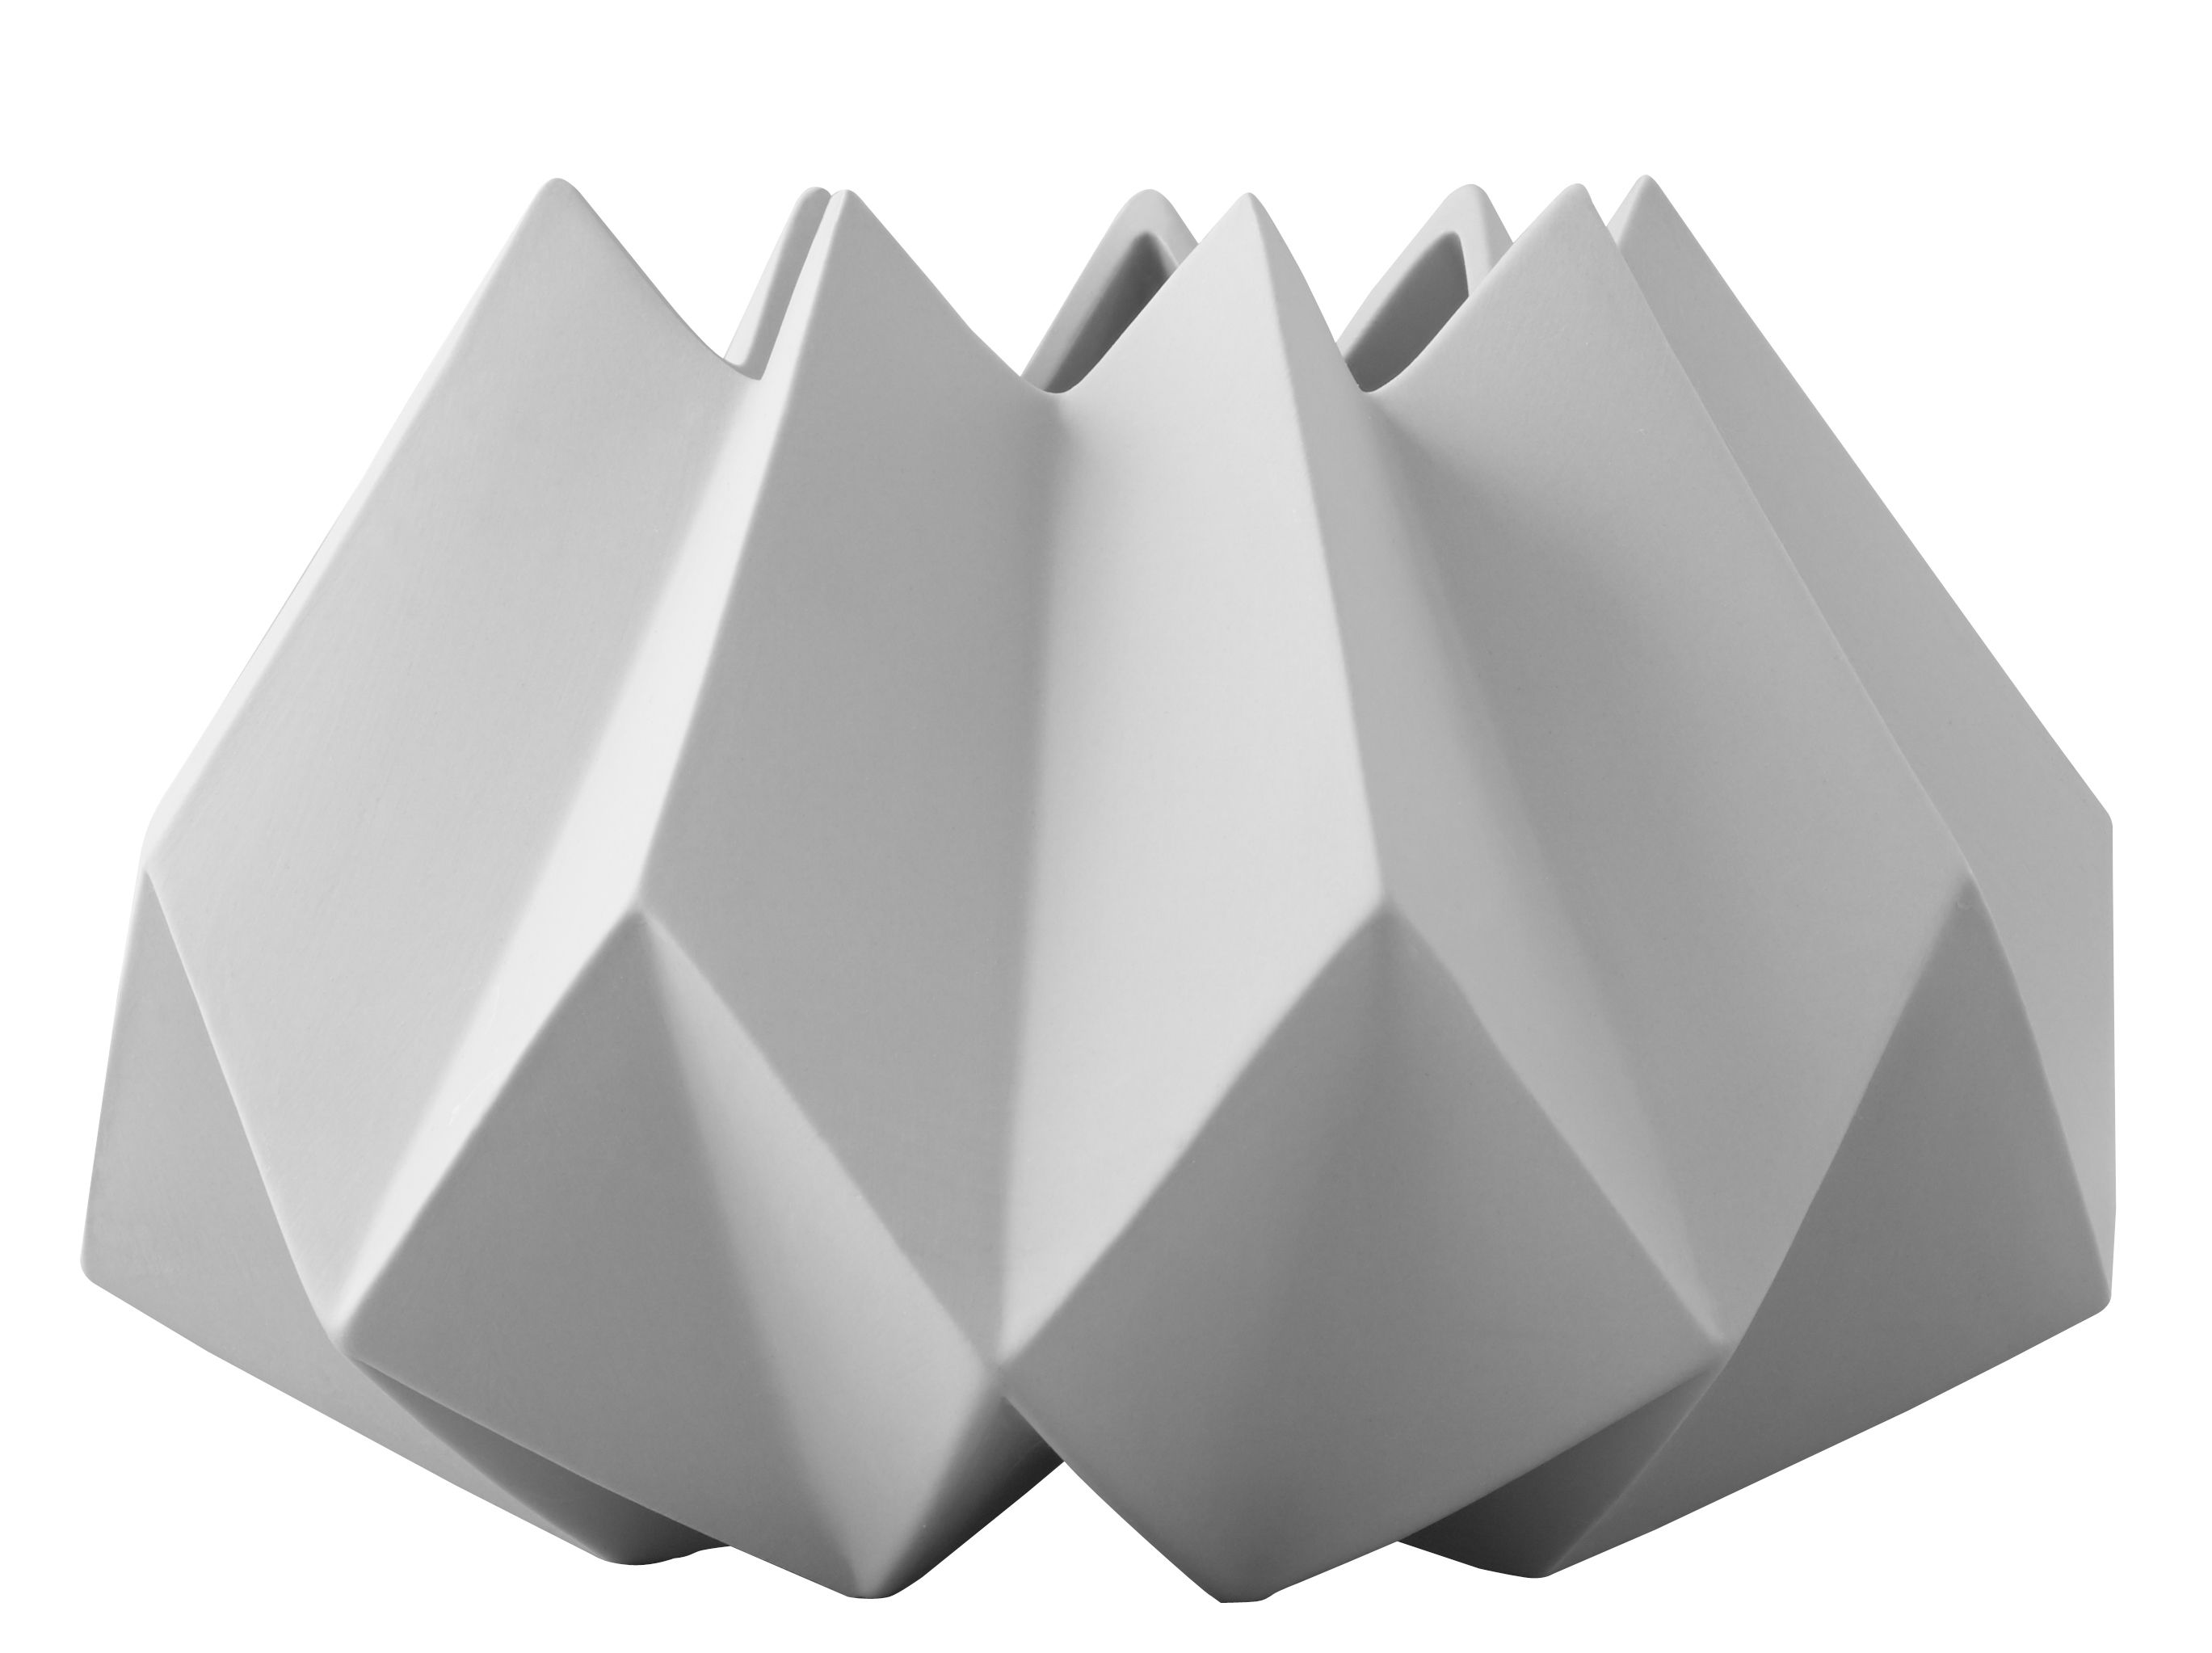 Decoration - Vases - Folded Vase - Clay - Ø 22 x H 15 cm by Menu - Ash - Clay